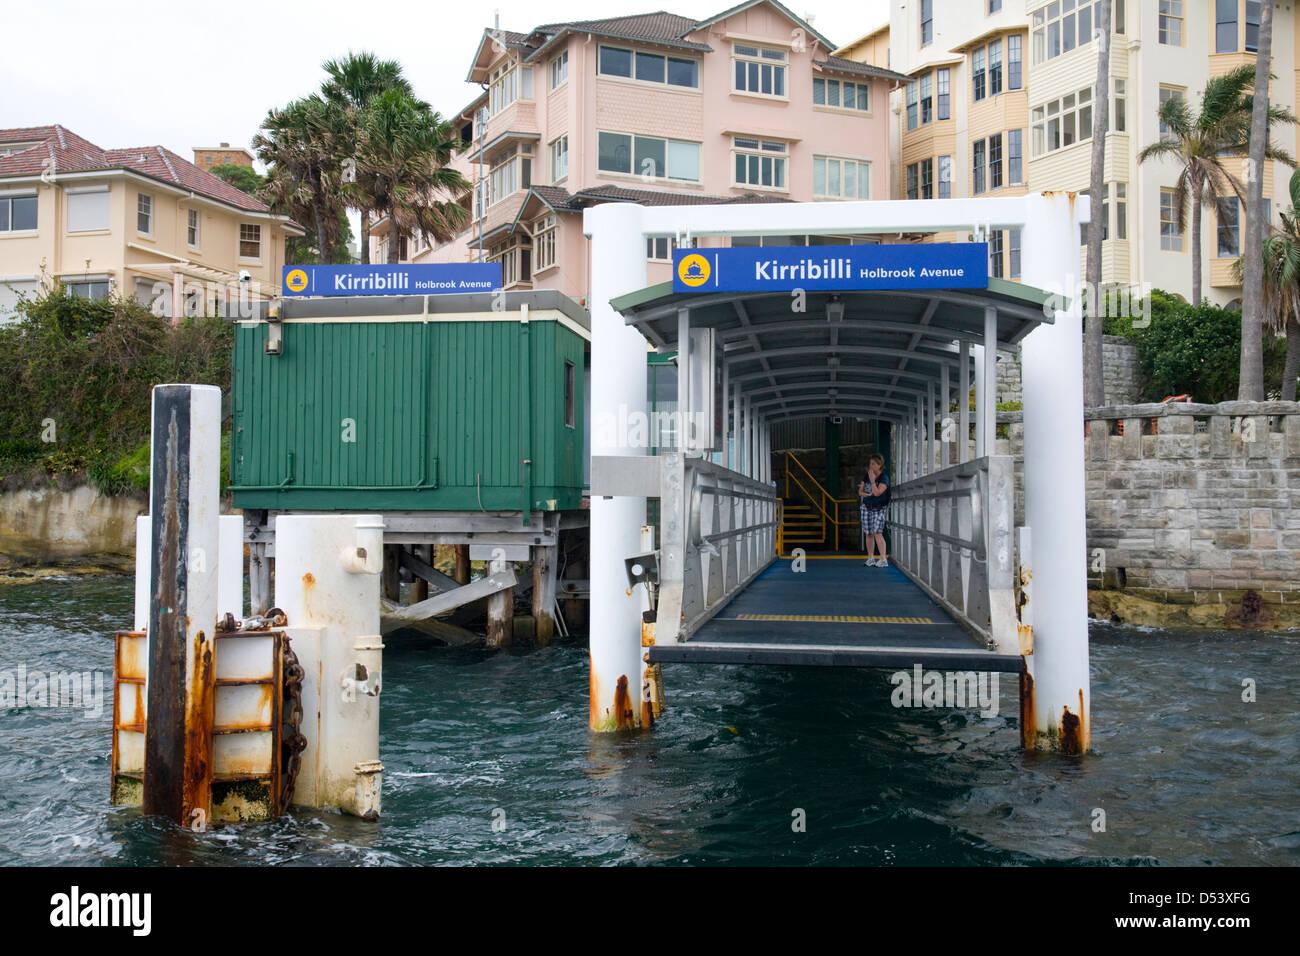 Kirribilli ferry wharf on Sydney harbour, new south wales,australia - Stock Image